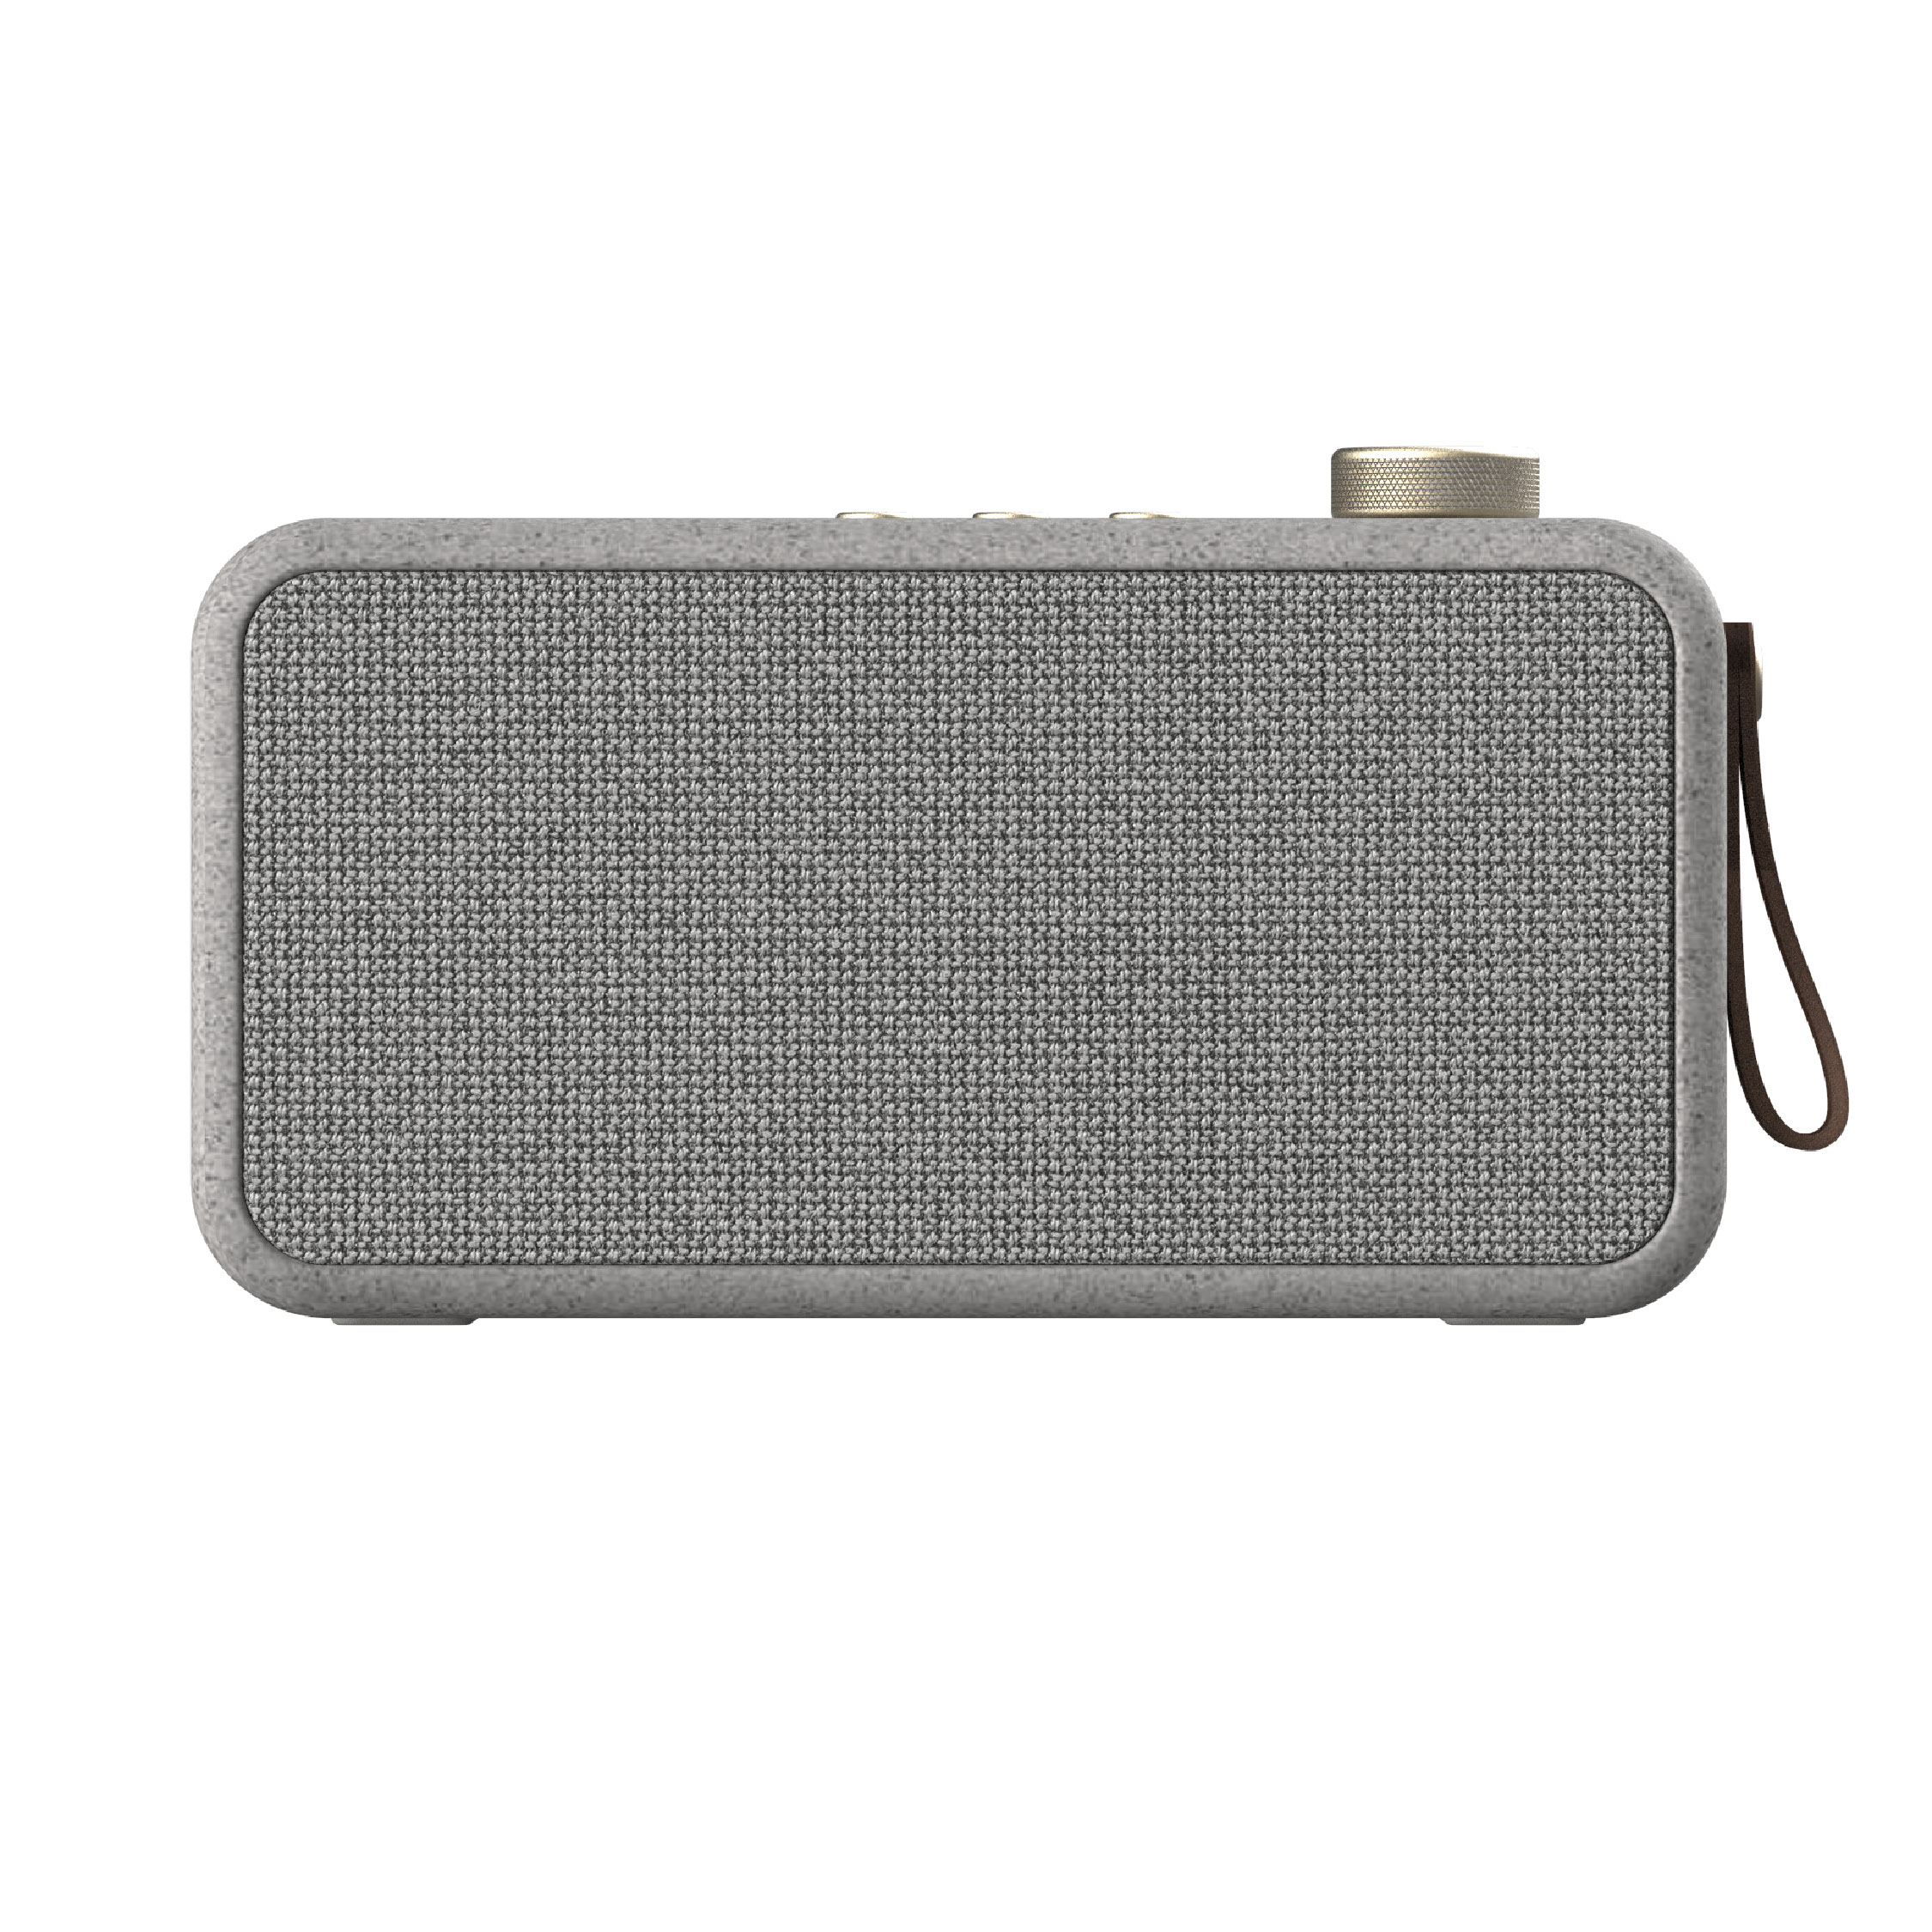 Kreafunk CARE aTUNE DAB+ radio, wheat fibre